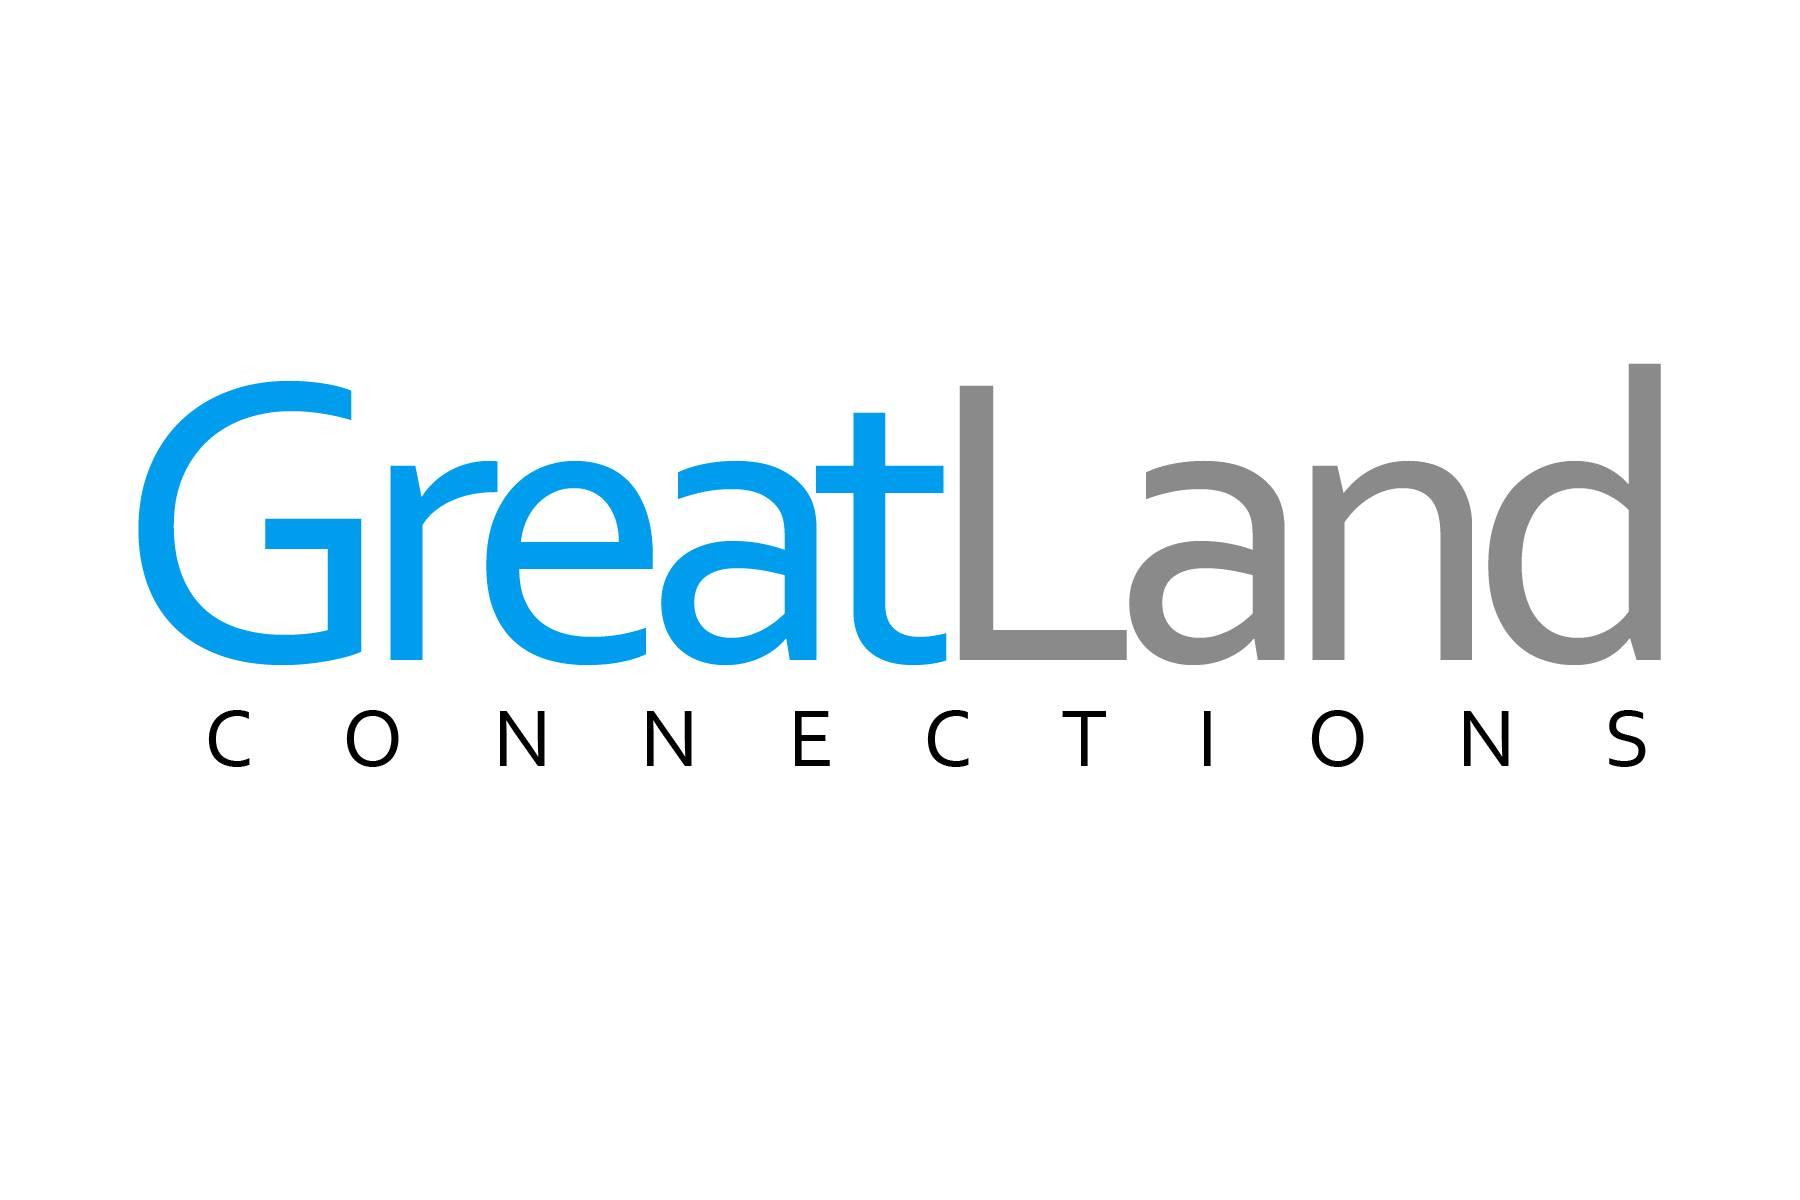 Greatland